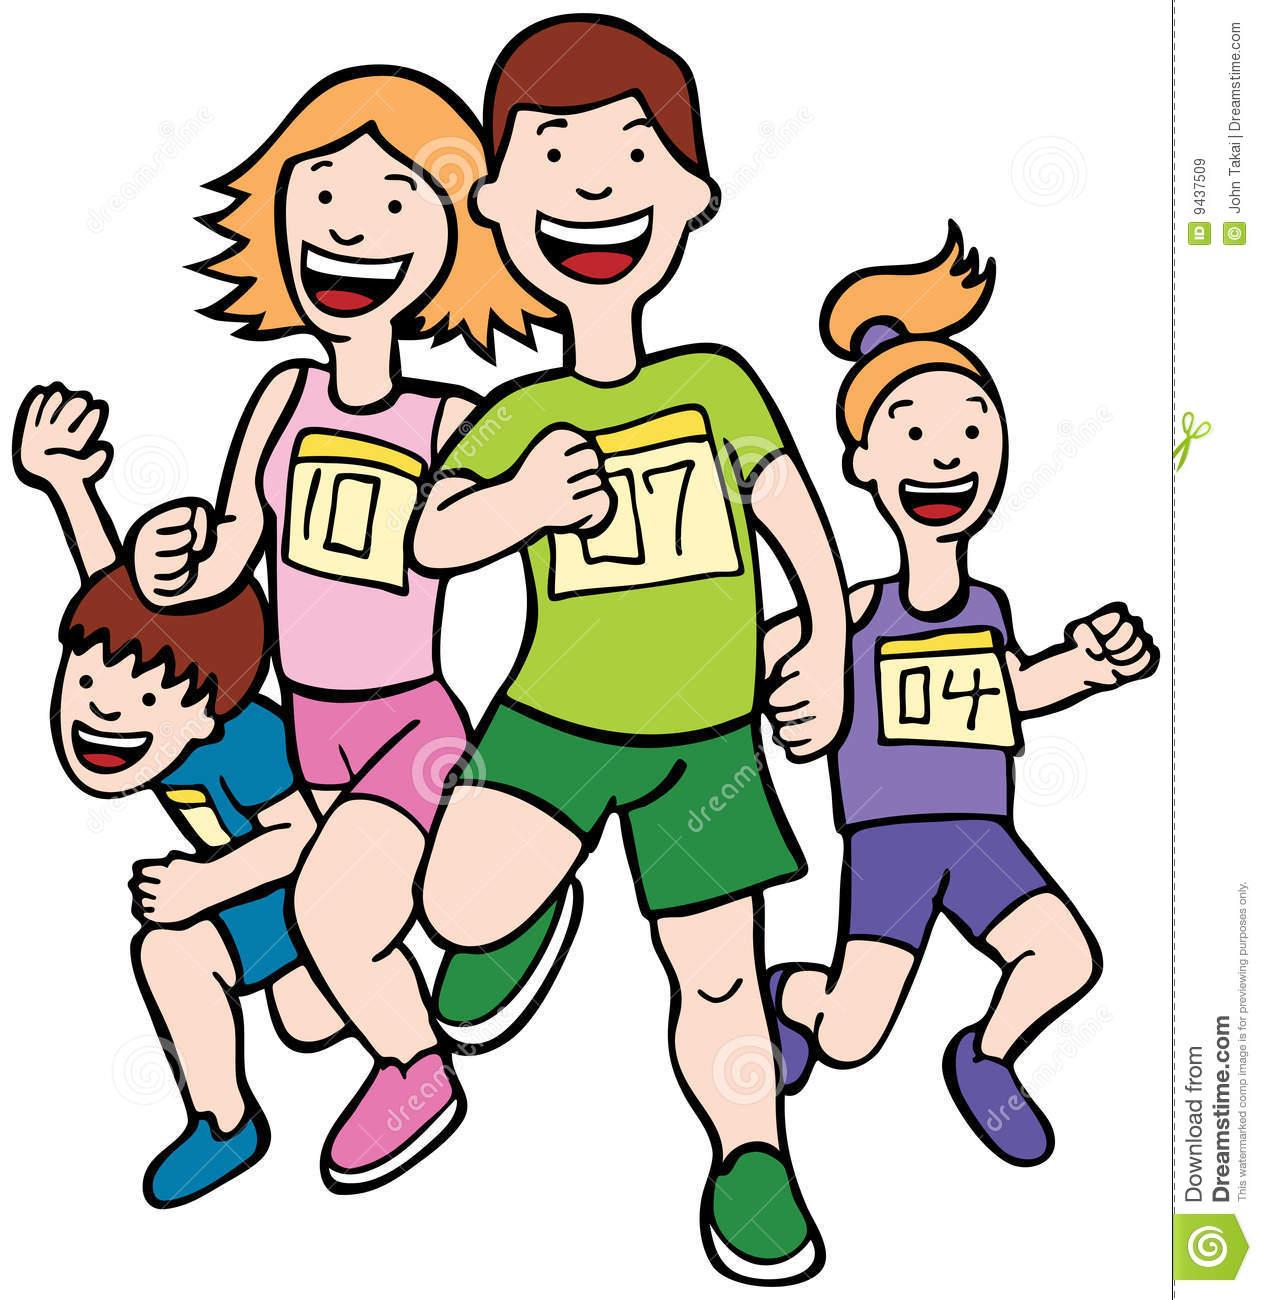 Race clipart excellence A Images Panda Race girl%20running%20race%20clipart